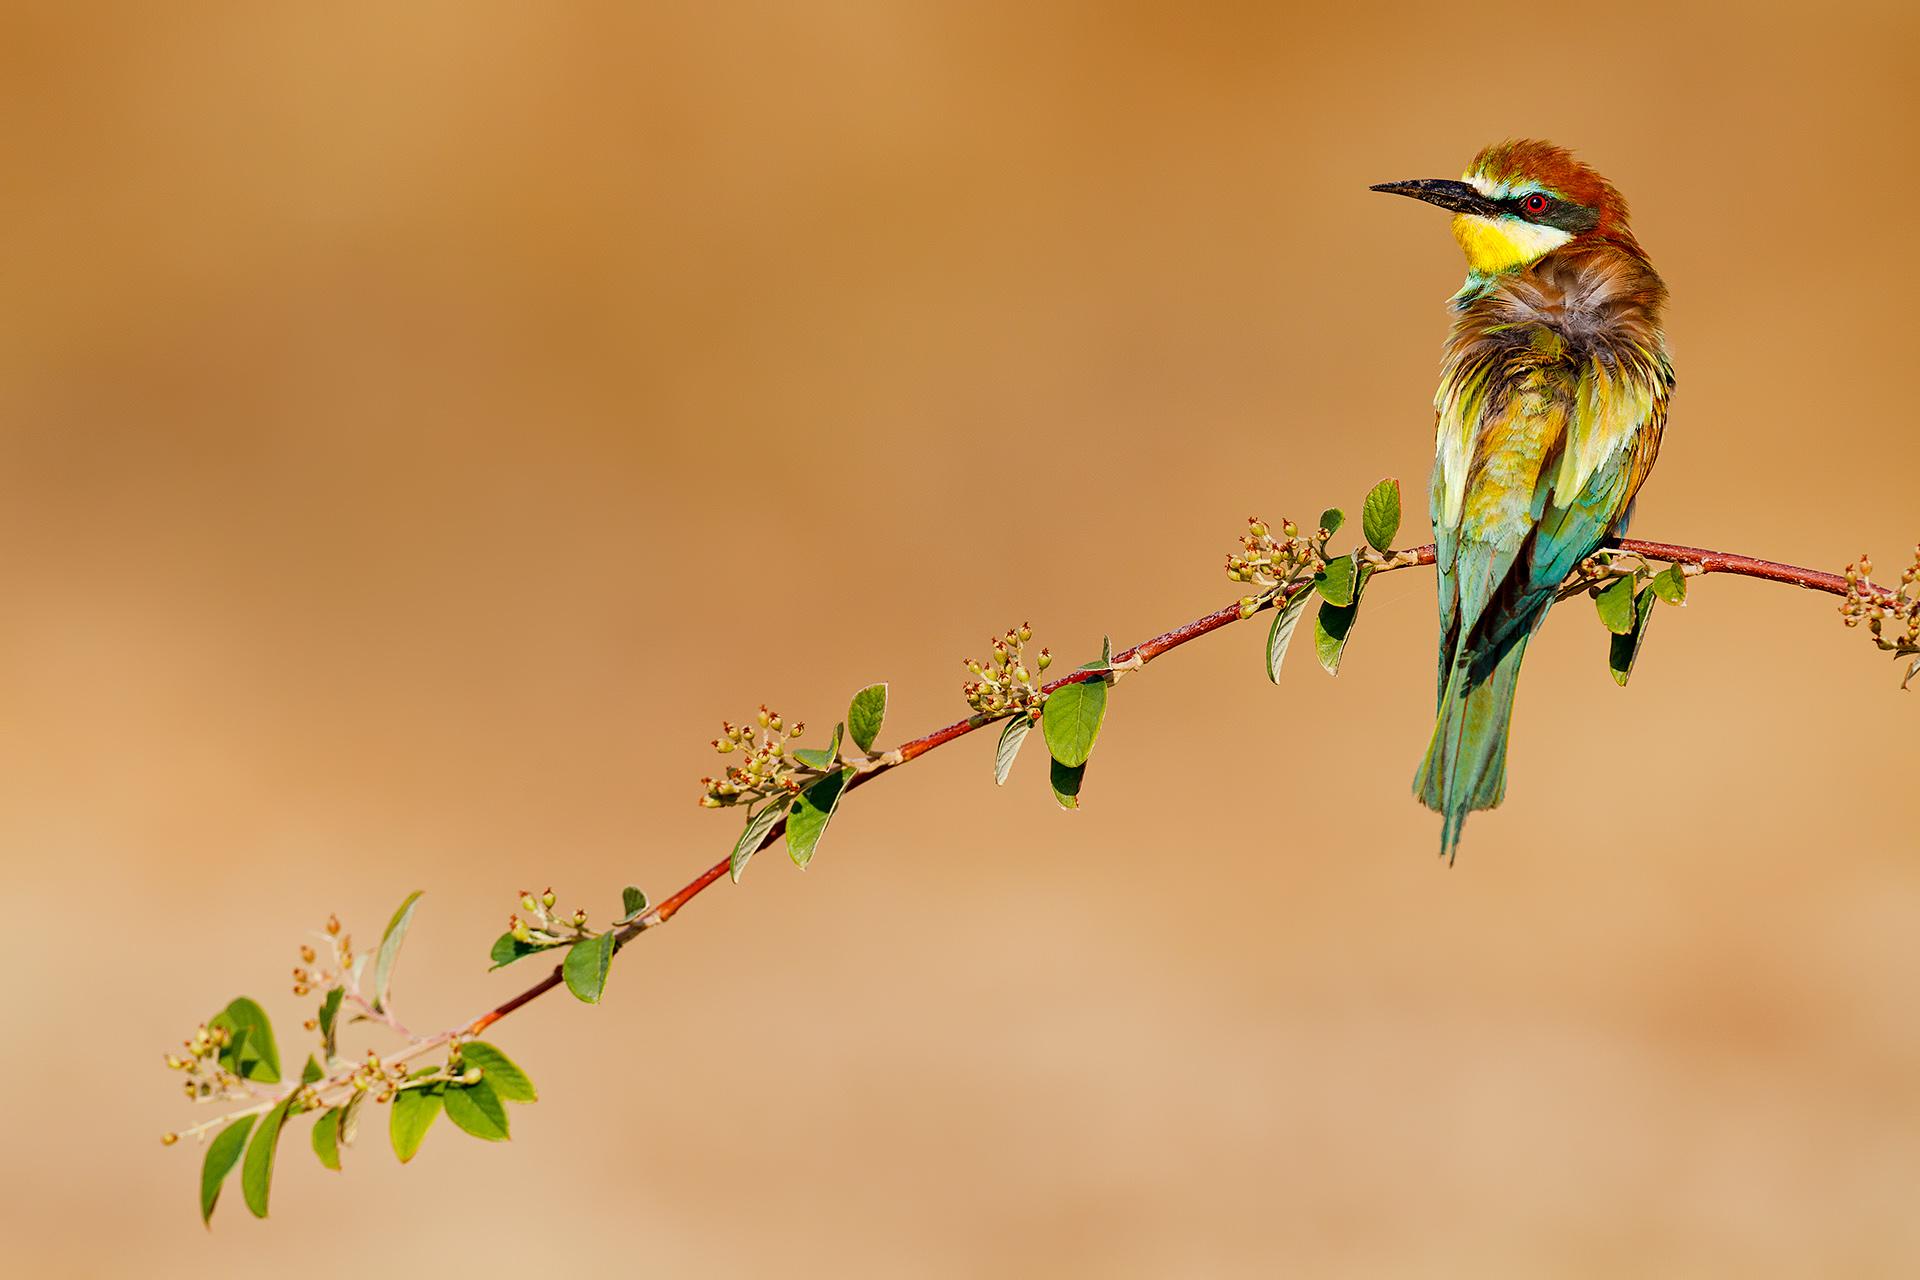 Composición de abejaruco - Mario Suarez - Portfolio Natural, Fotografía de Naturaleza de Autor